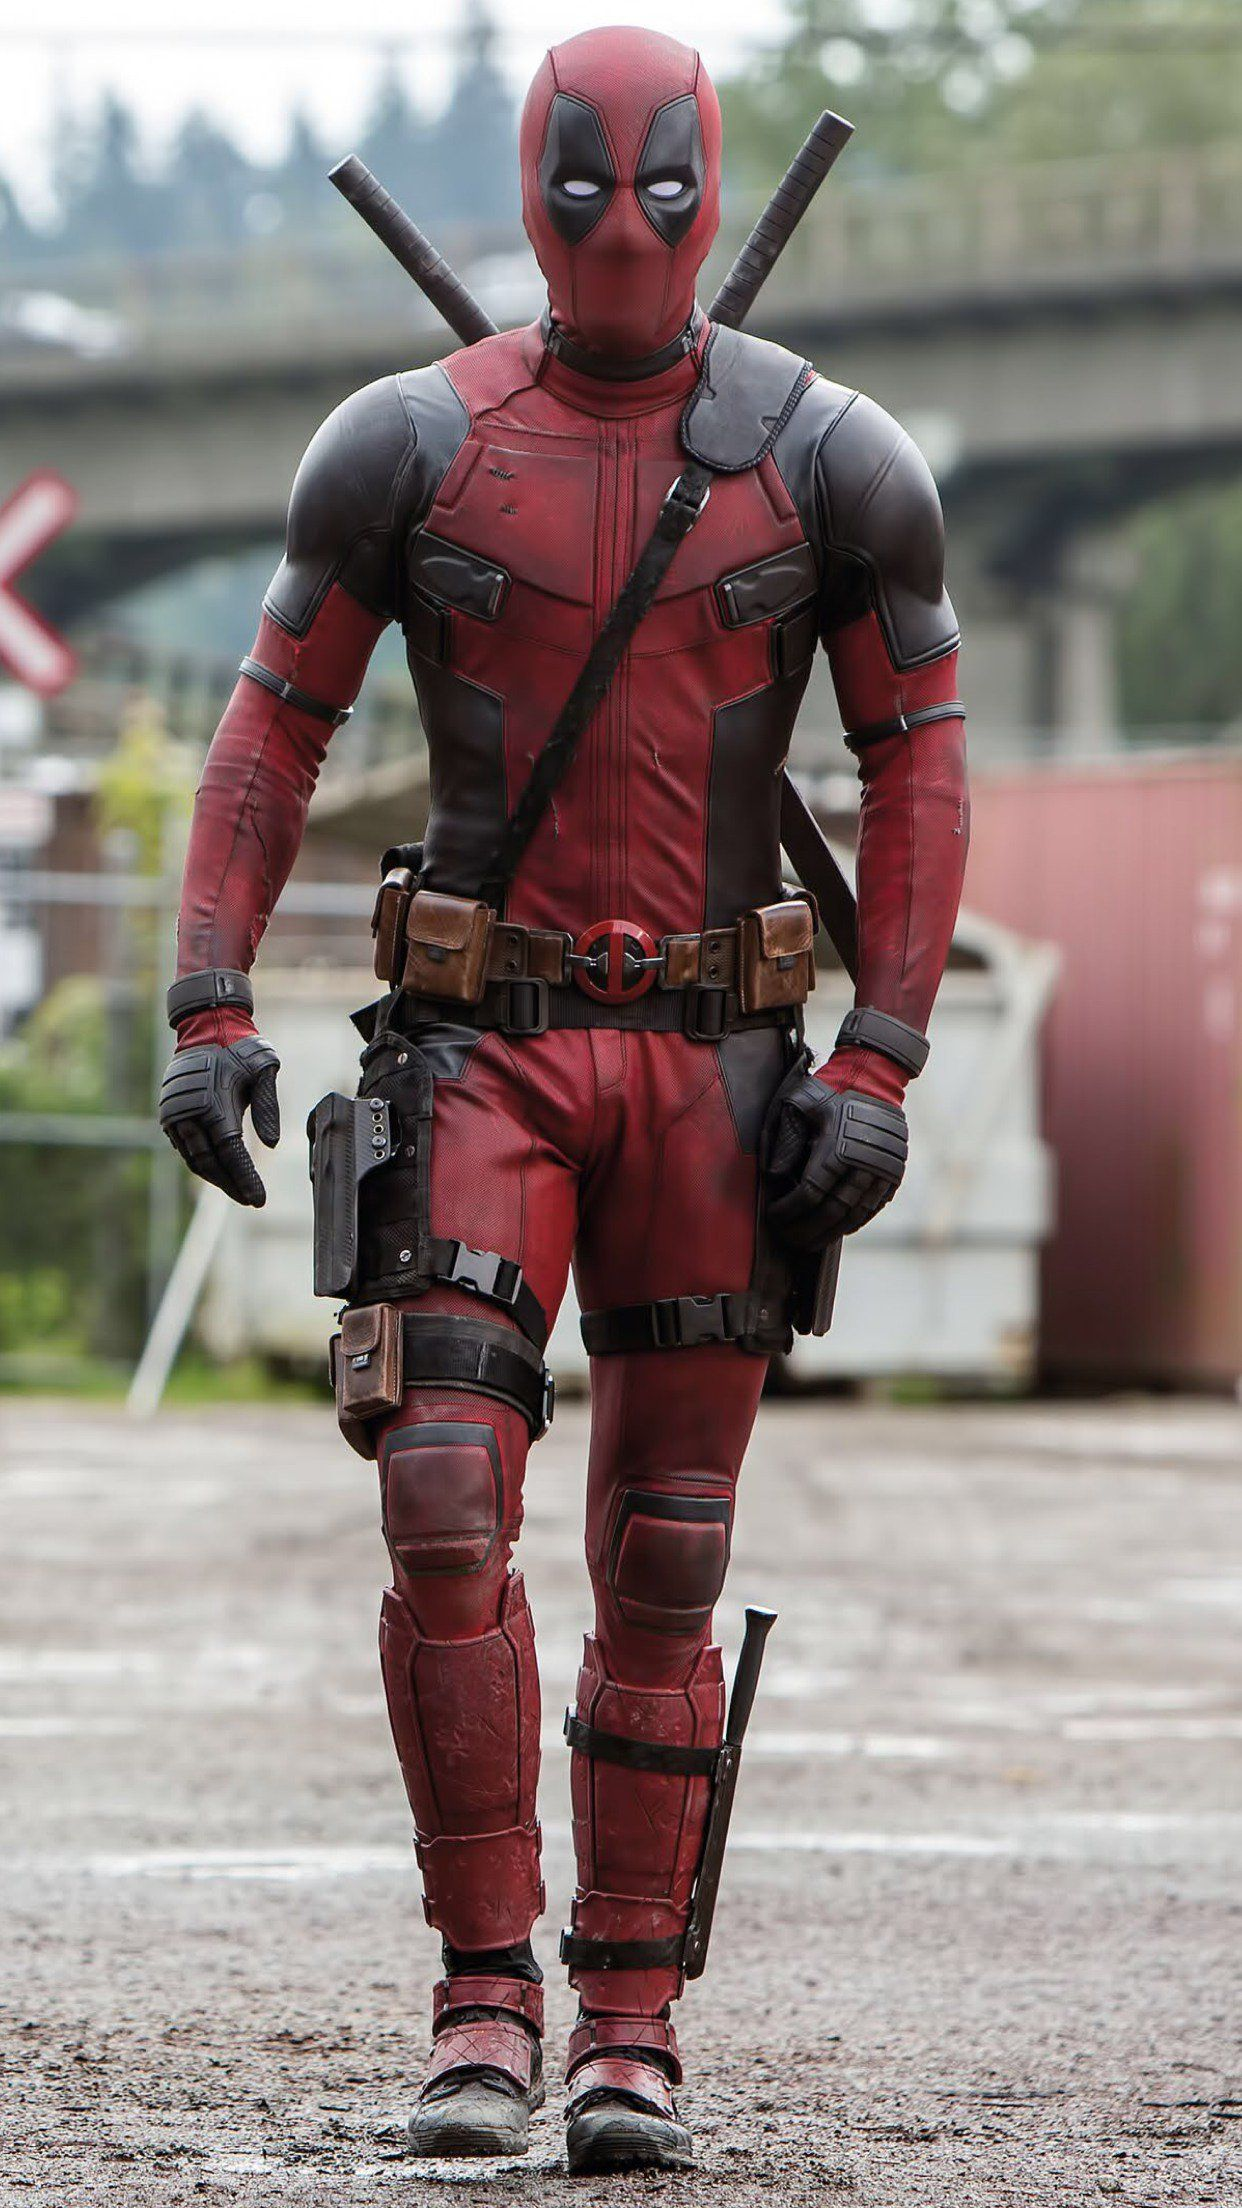 Who Plays Deadpool In The Deadpool Movie